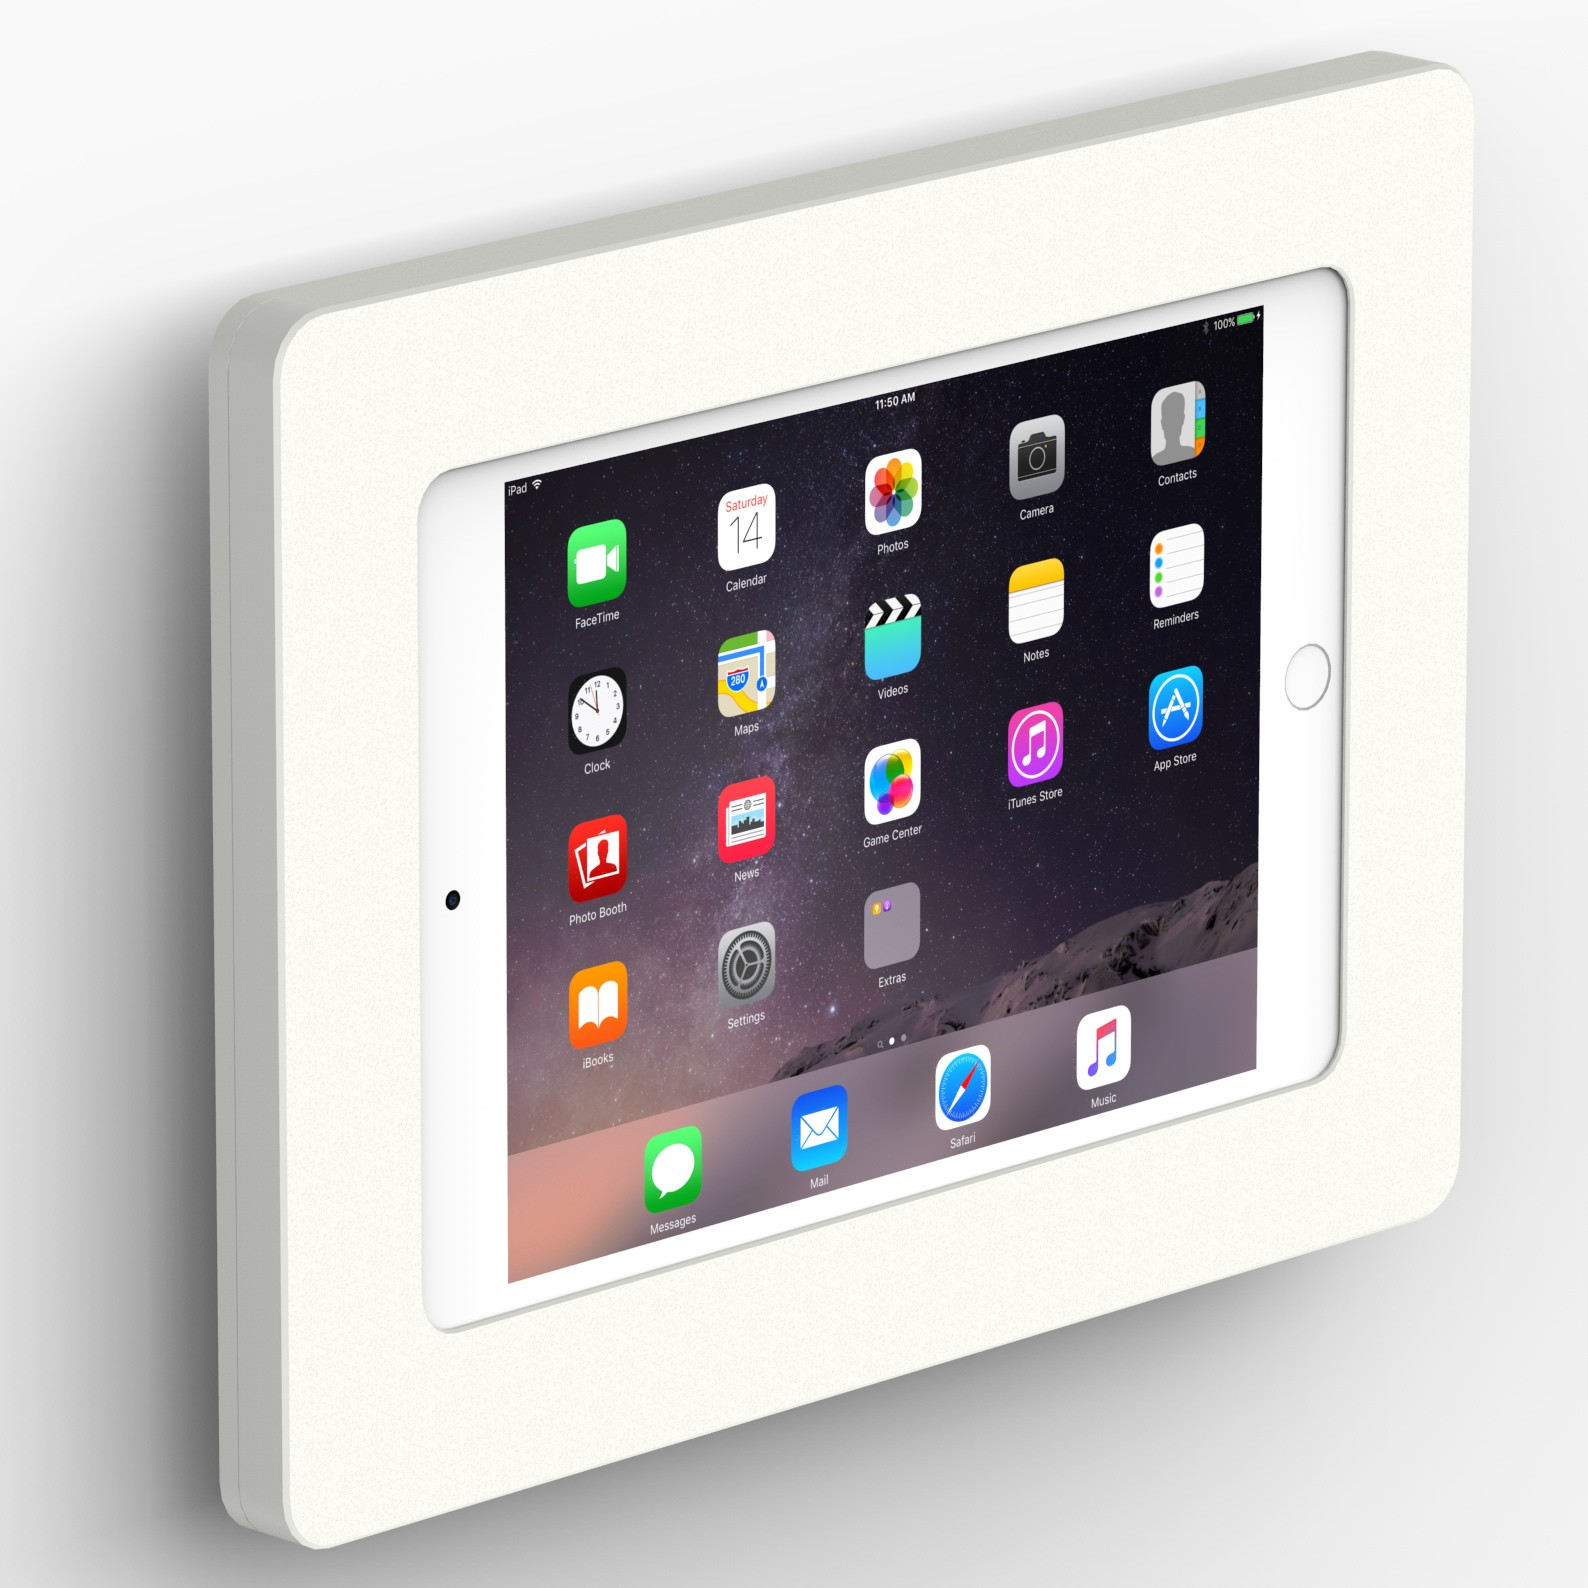 Fixed Wall Ipad Tablet Surface Mount Vidabox Kiosks